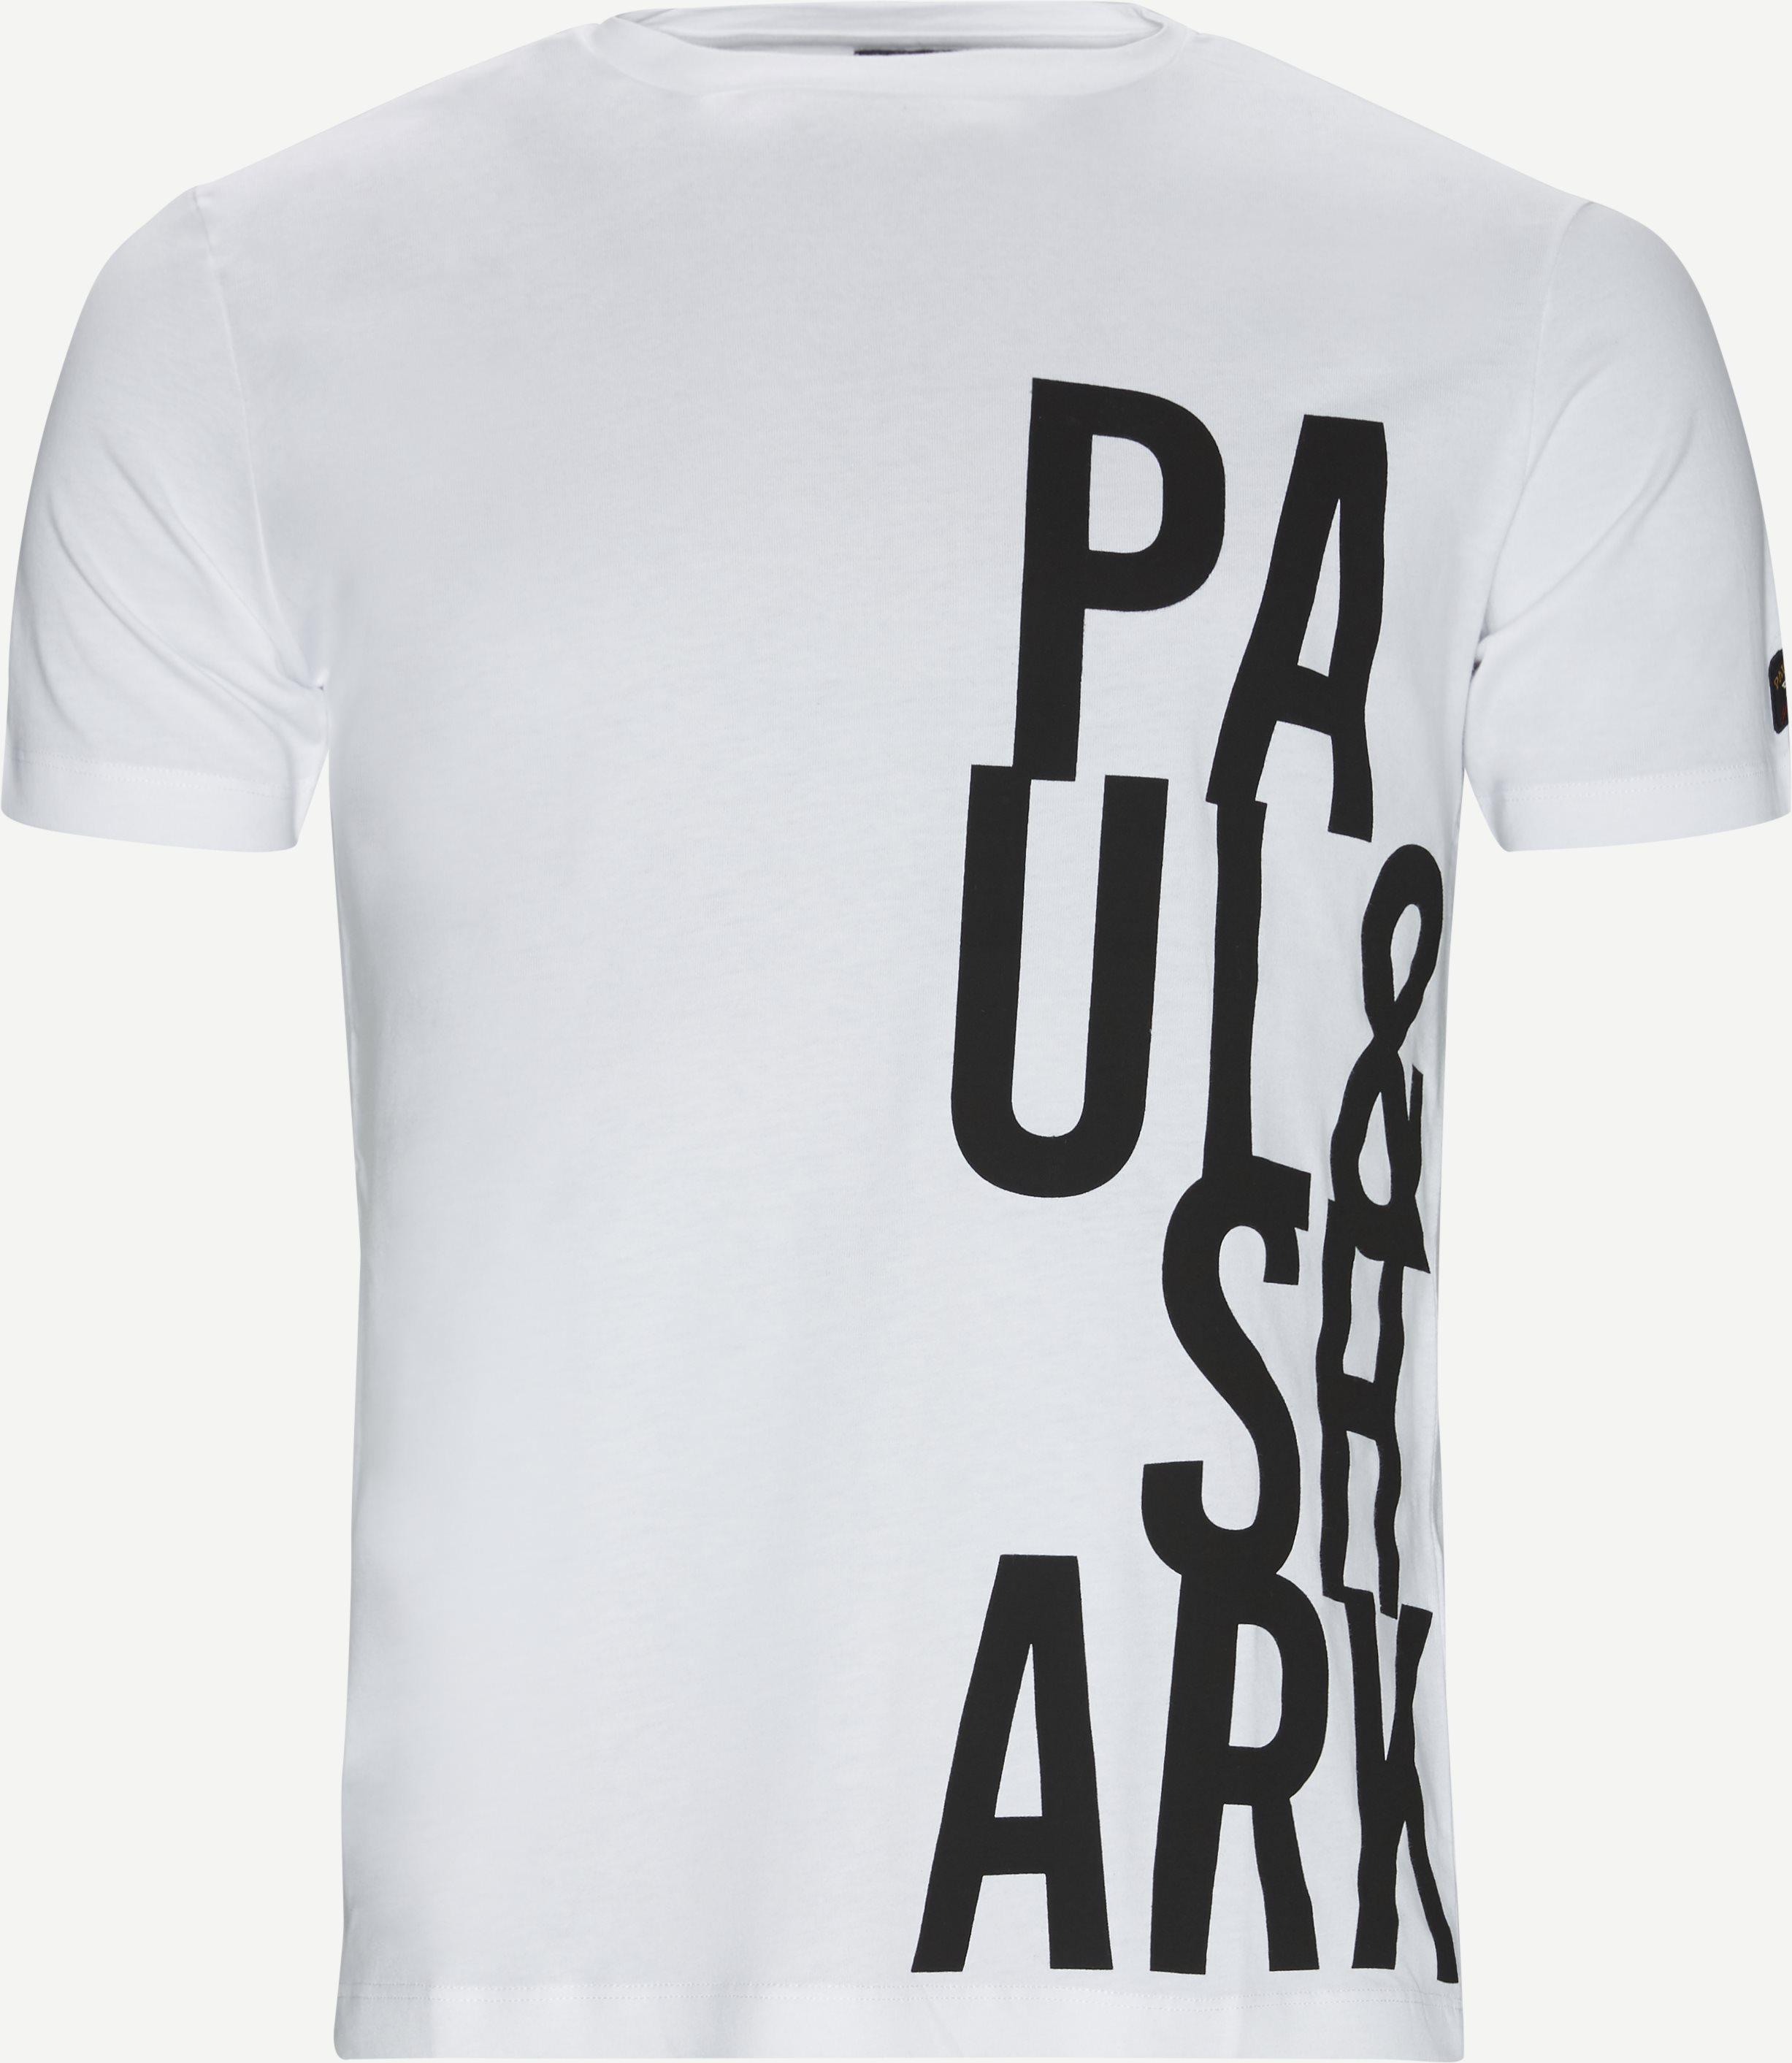 Ezop T-shirt - T-shirts - Regular fit - Hvid